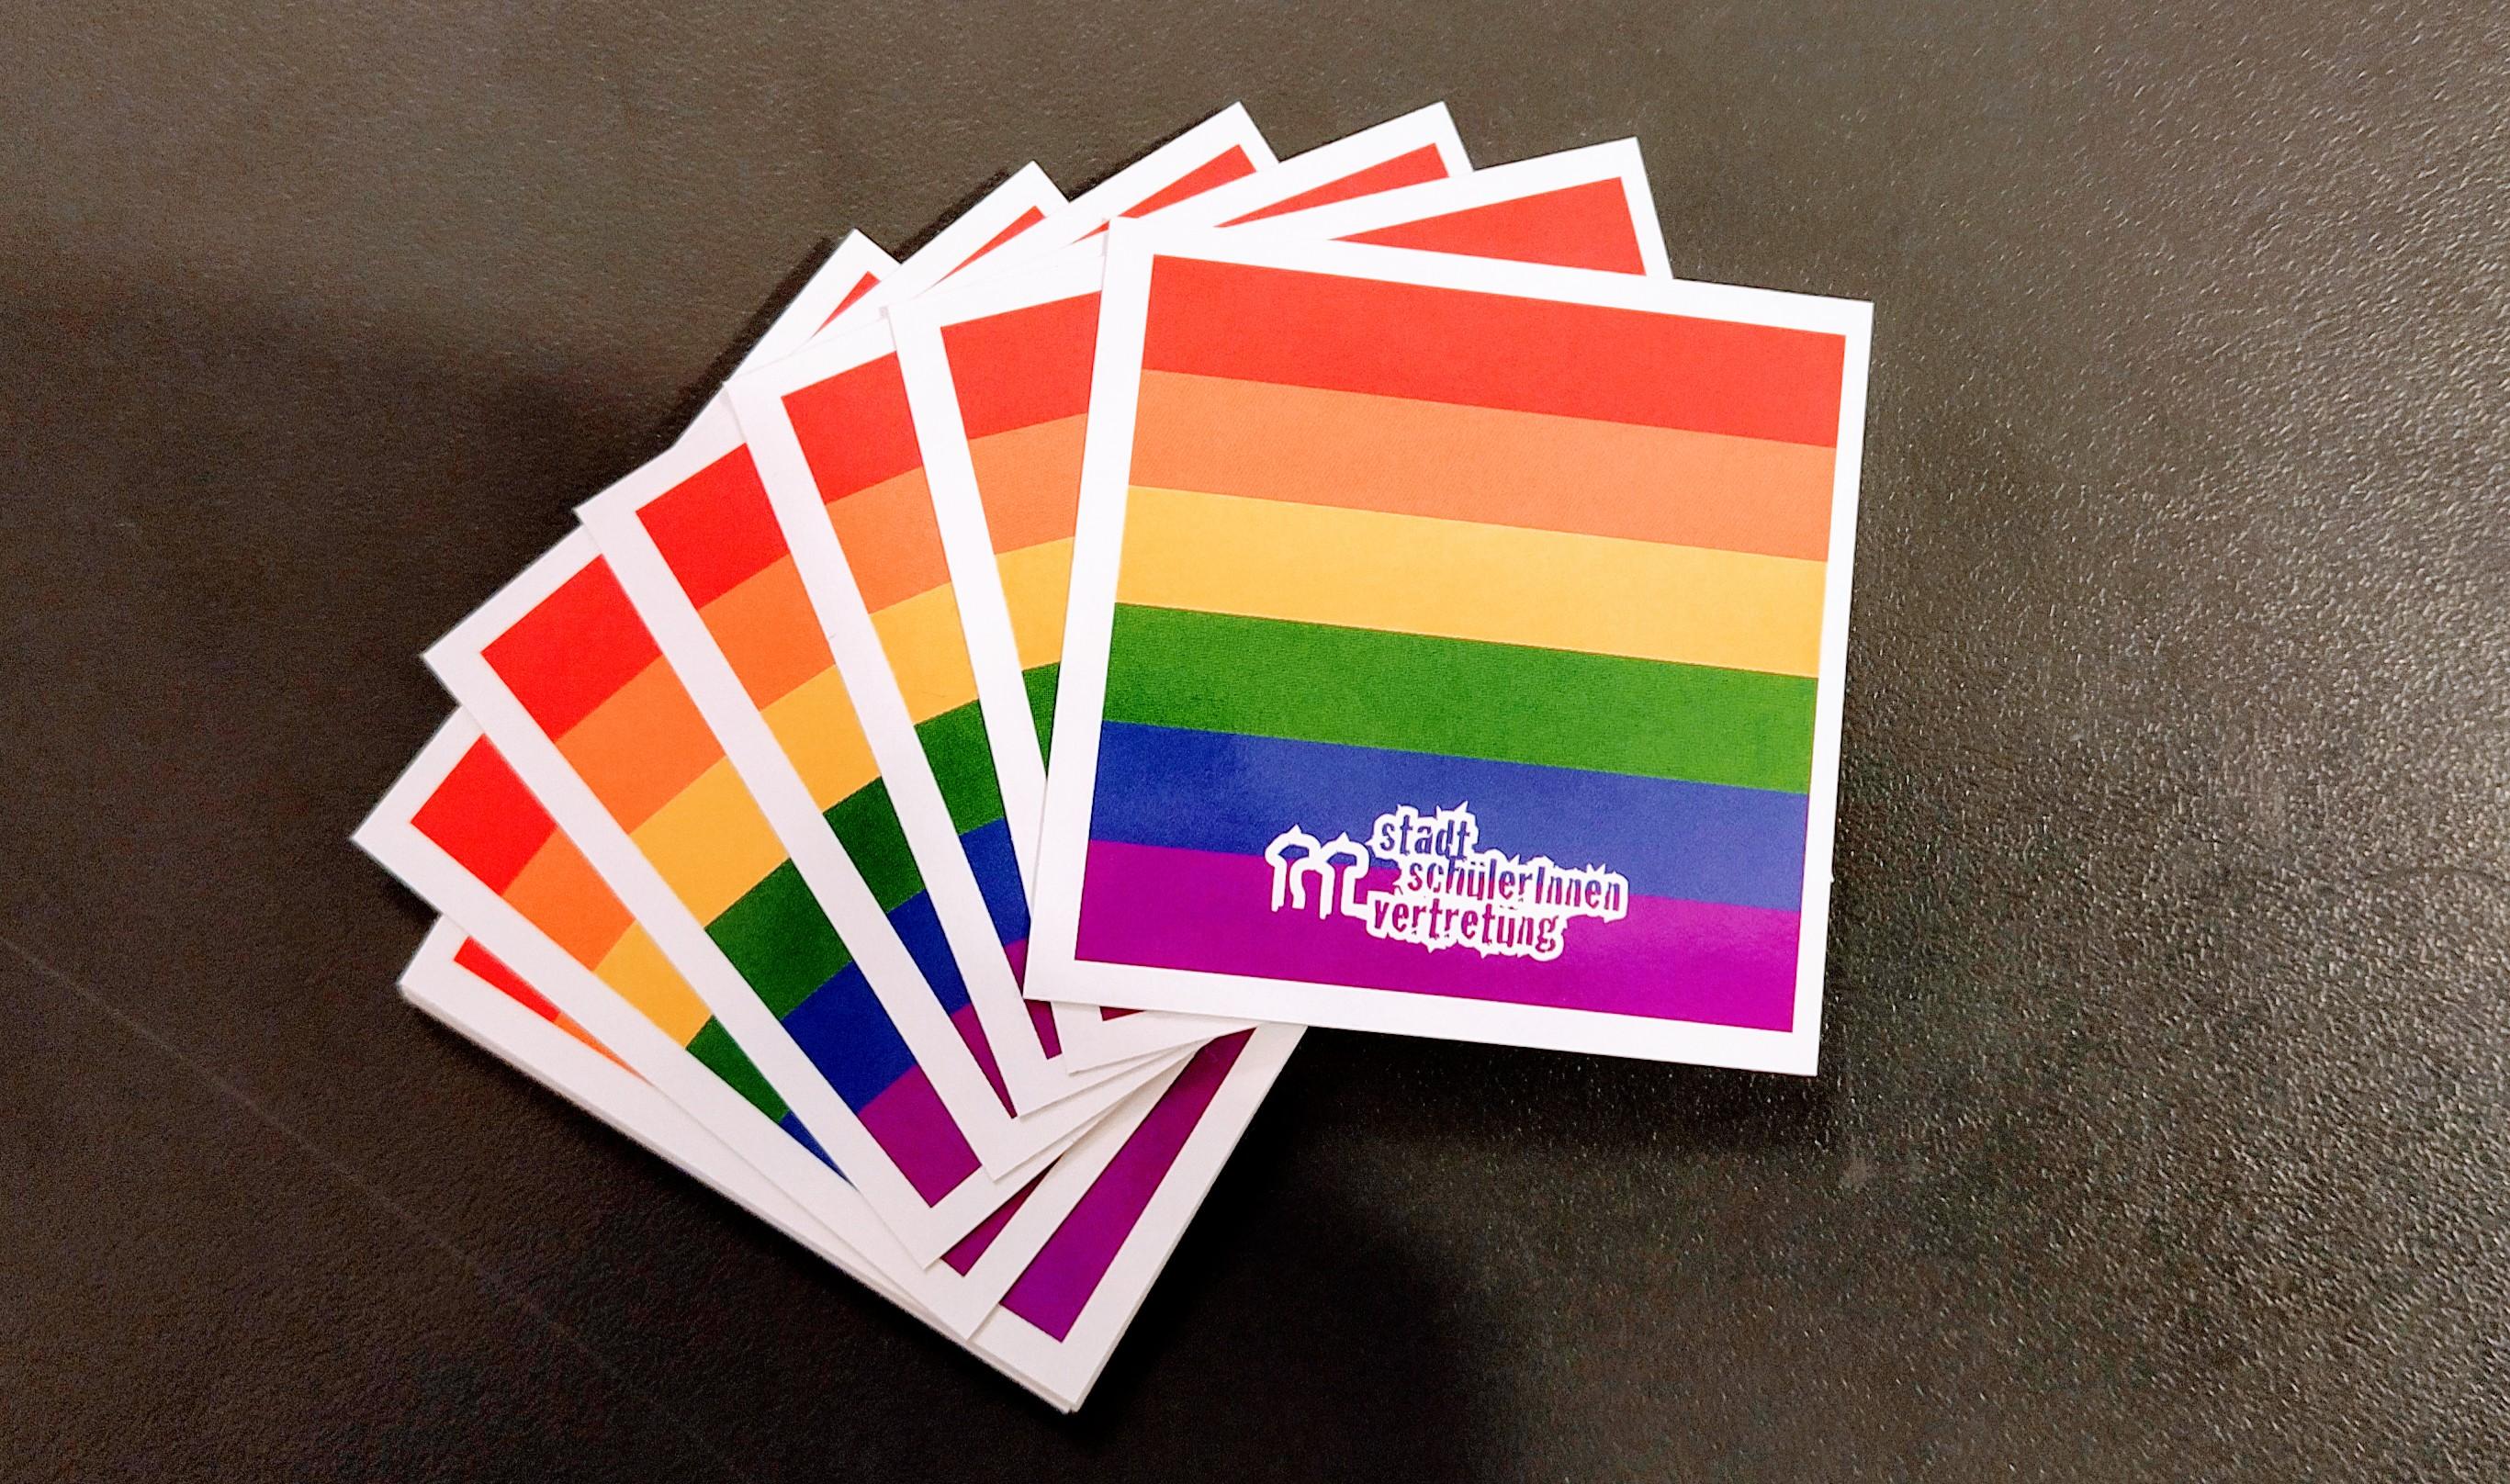 Unsere pride flag-Sticker